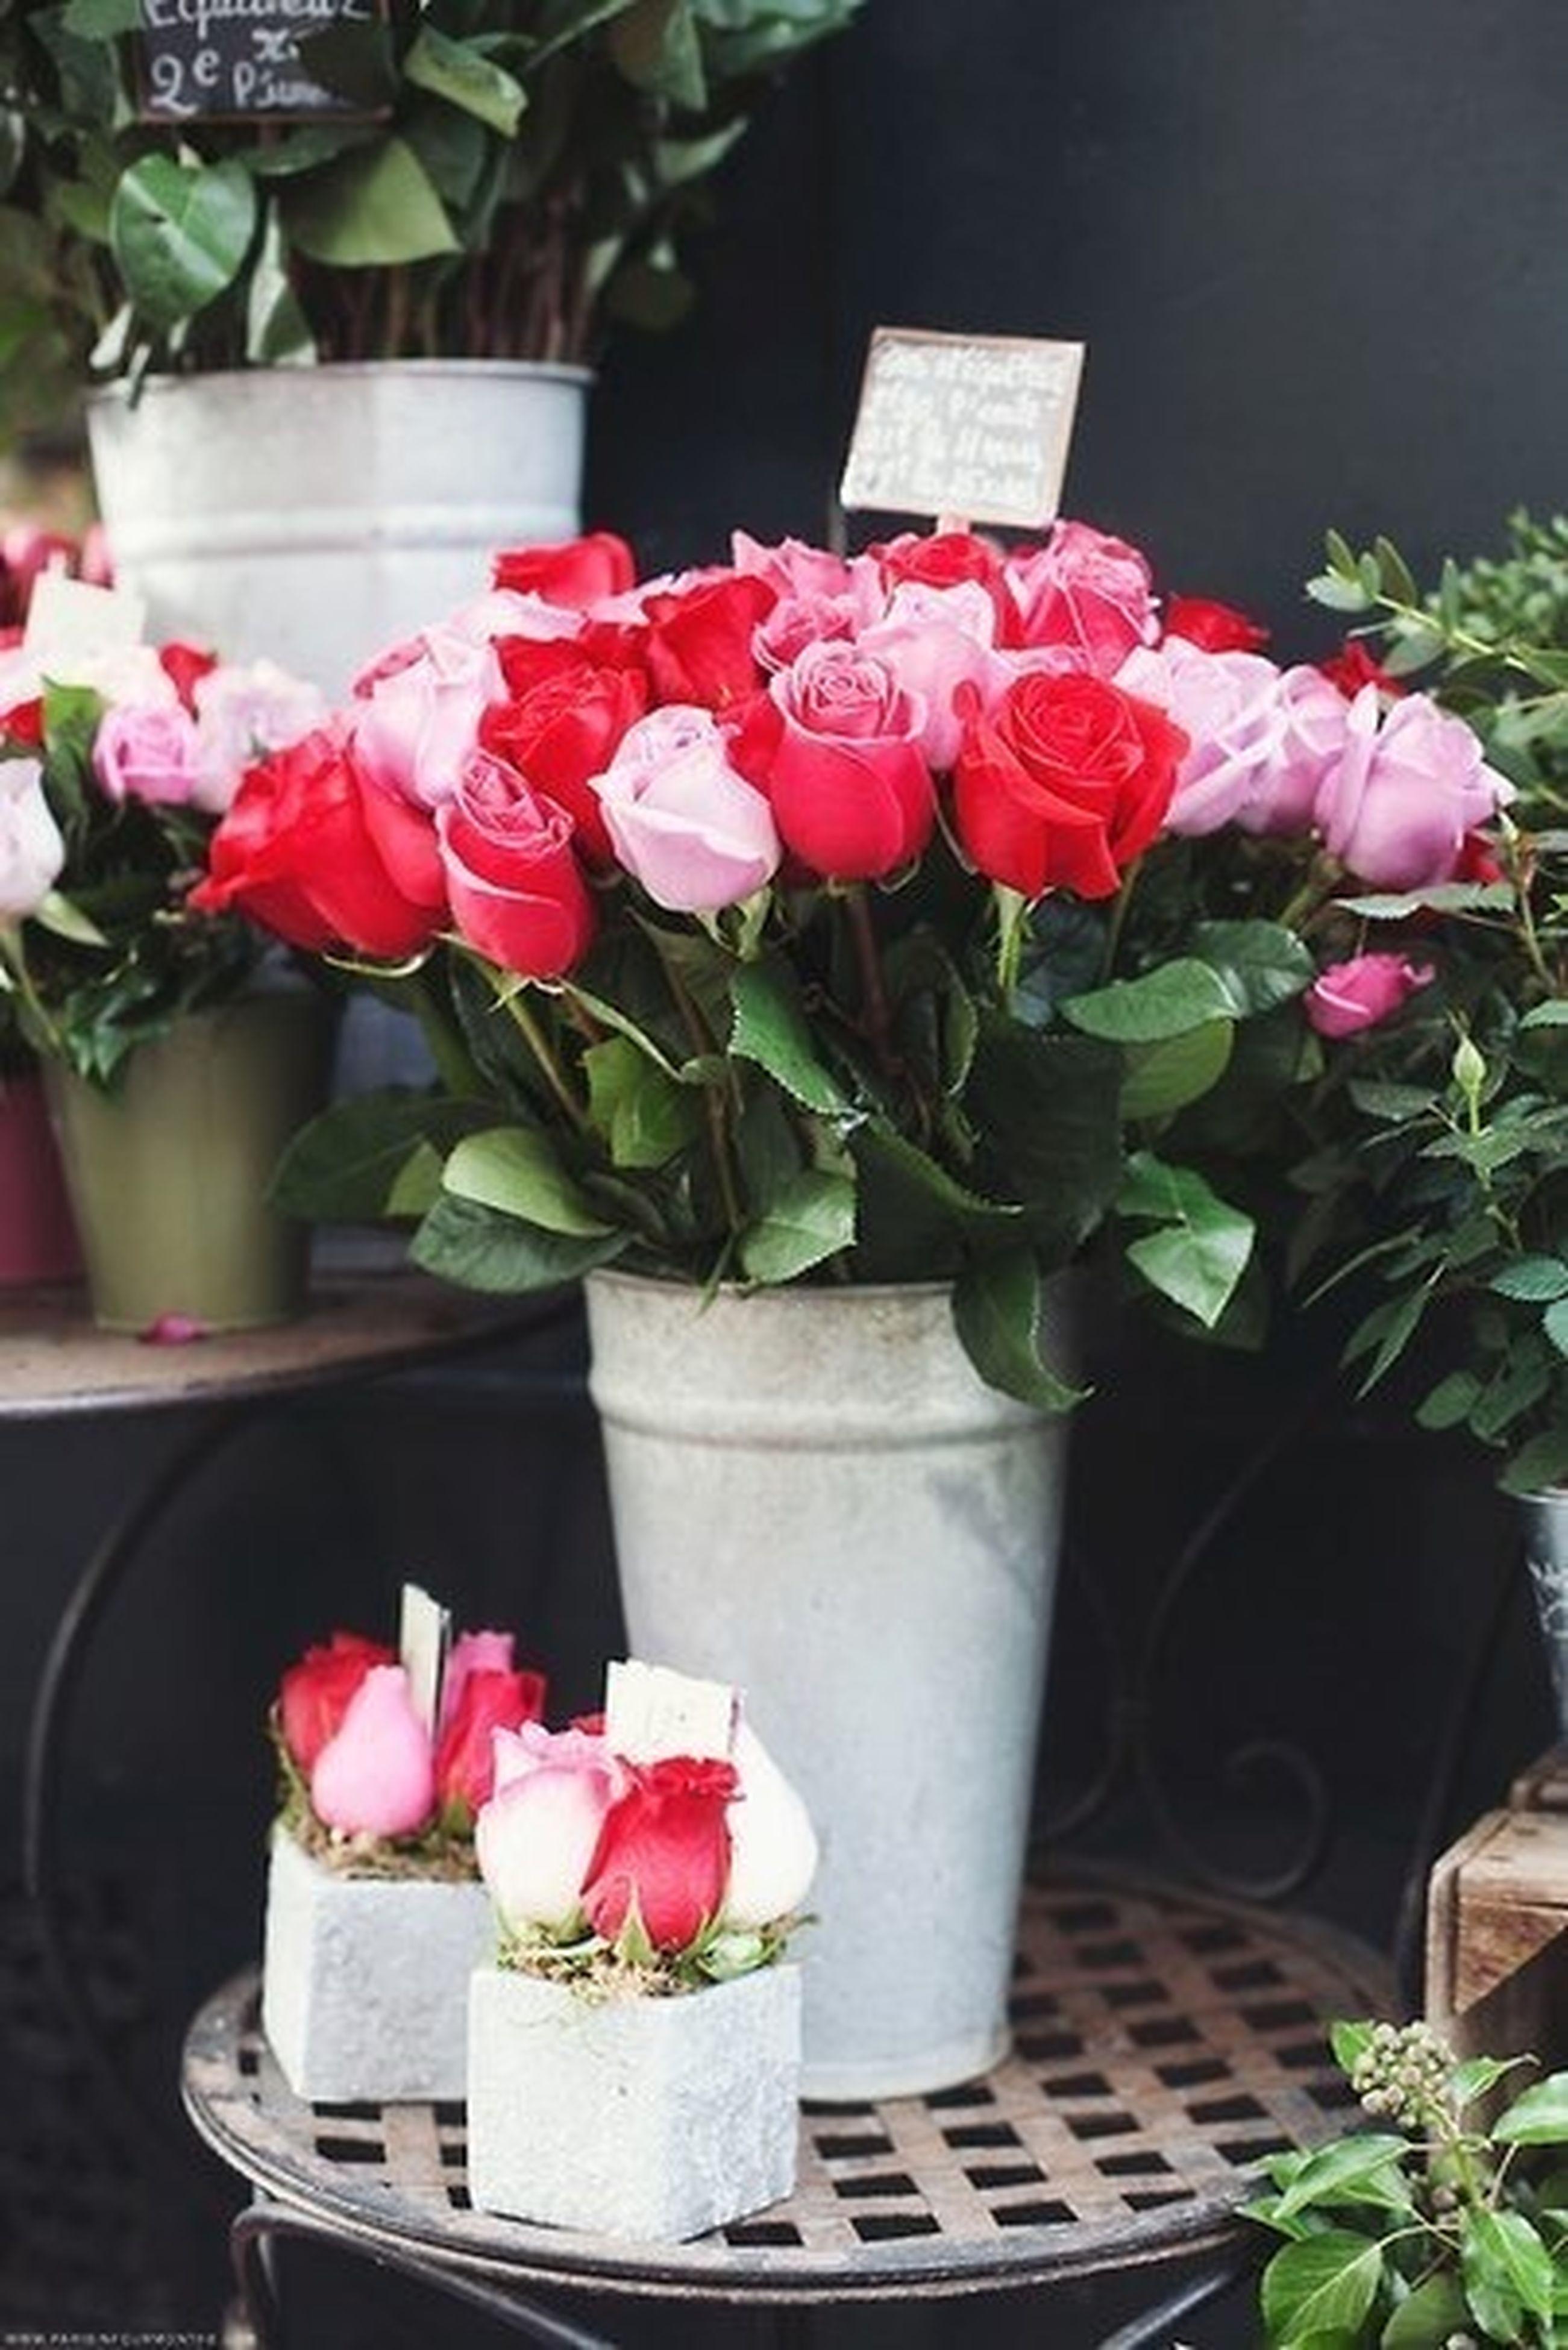 flower, freshness, potted plant, fragility, vase, plant, pink color, flower pot, growth, petal, indoors, table, rose - flower, beauty in nature, flower head, nature, close-up, leaf, bouquet, flower arrangement